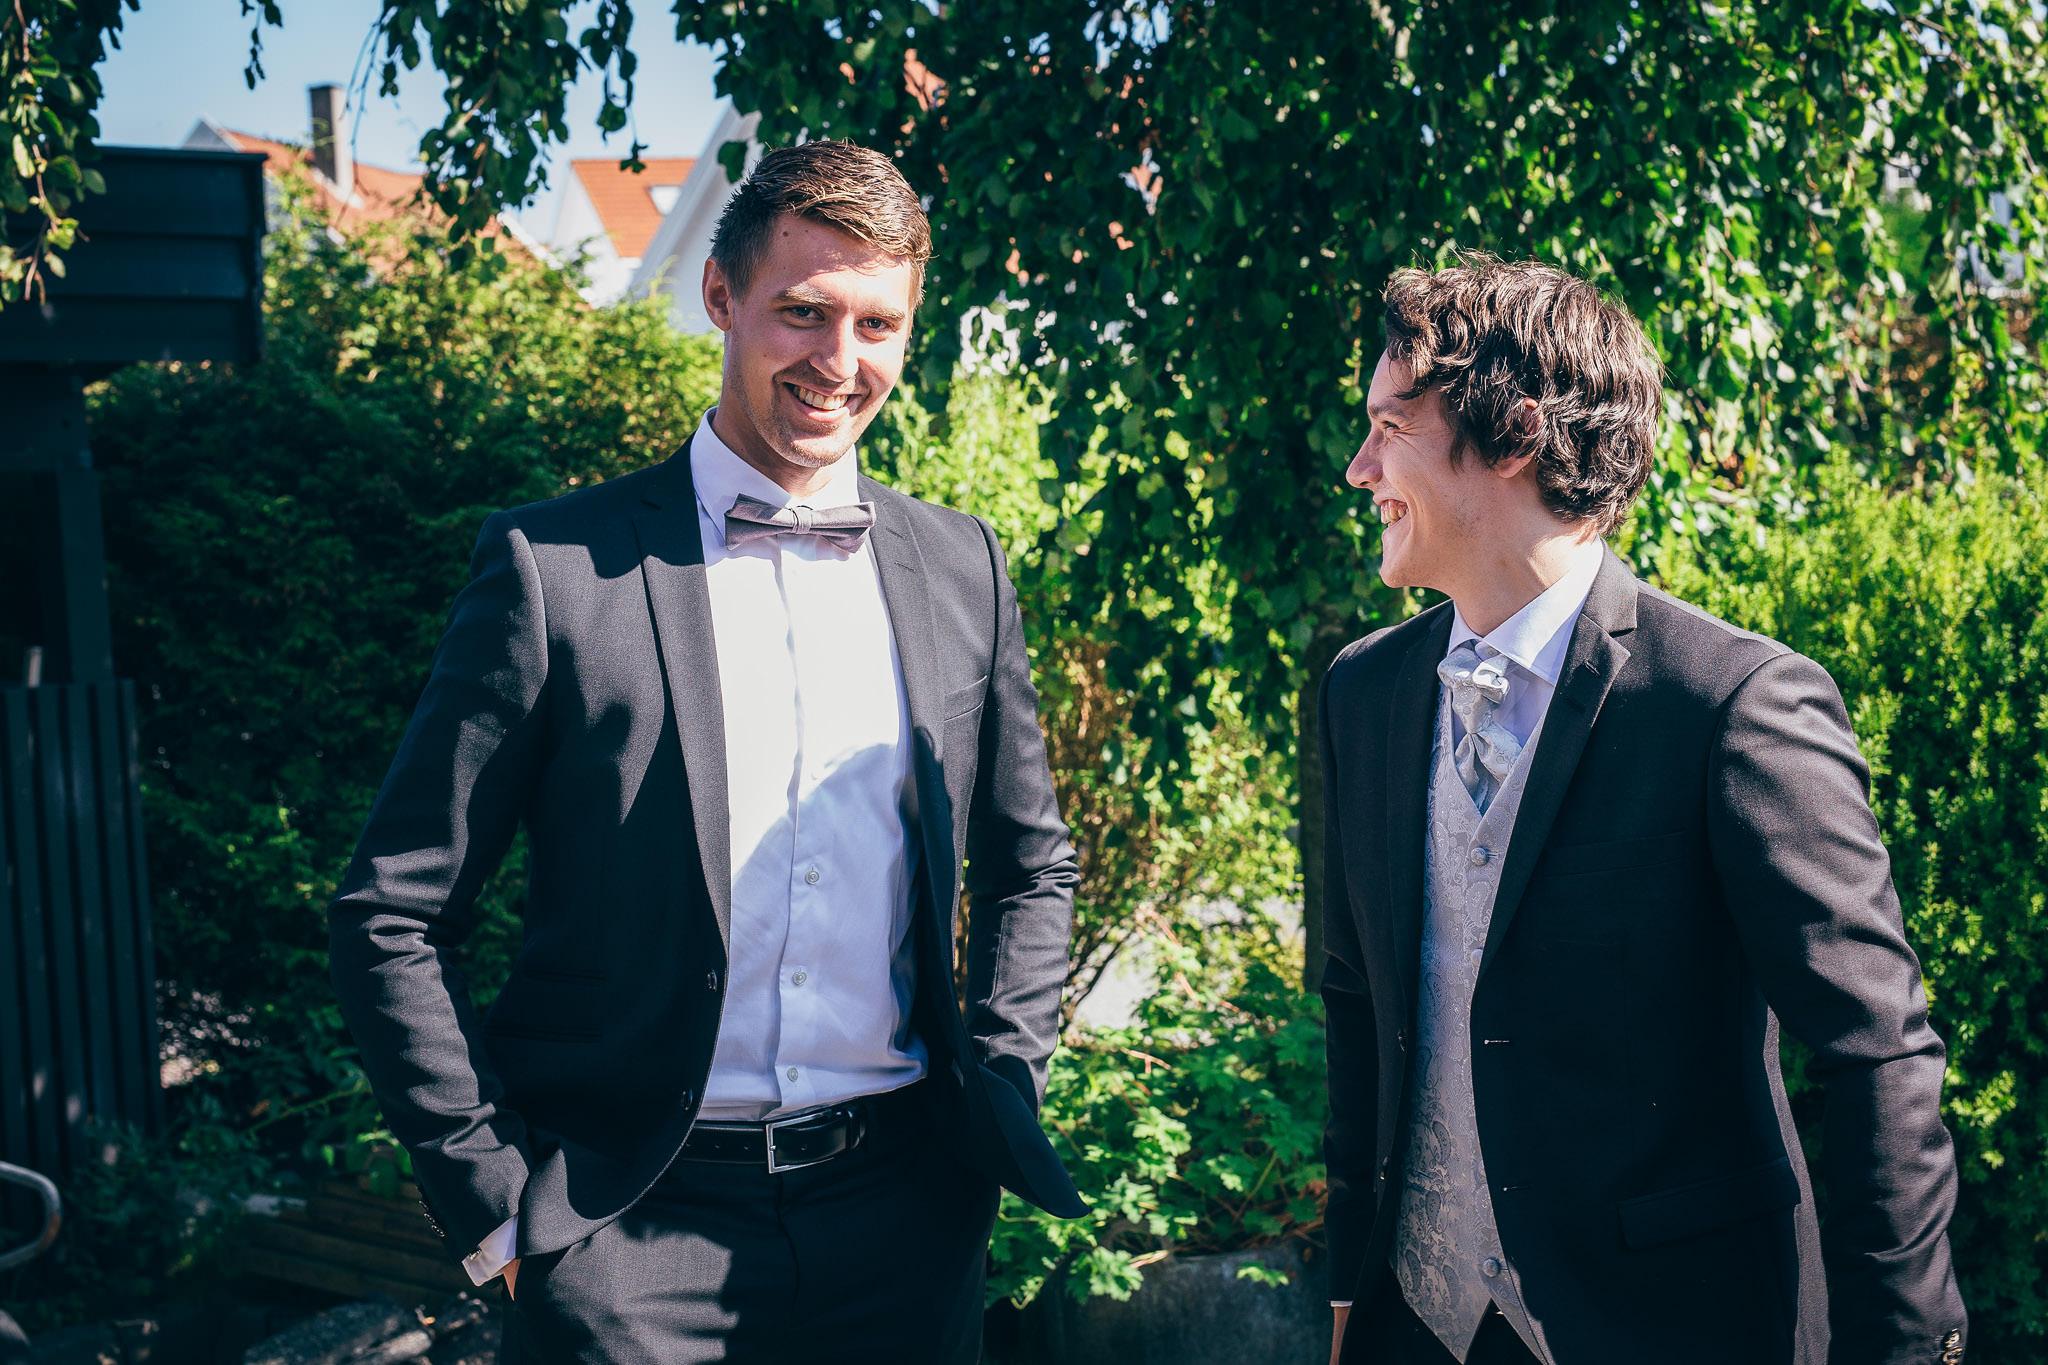 Wedding+Photographer+Norway+Bryllupsfotograf+Casey+Arneson+JT-14.jpg